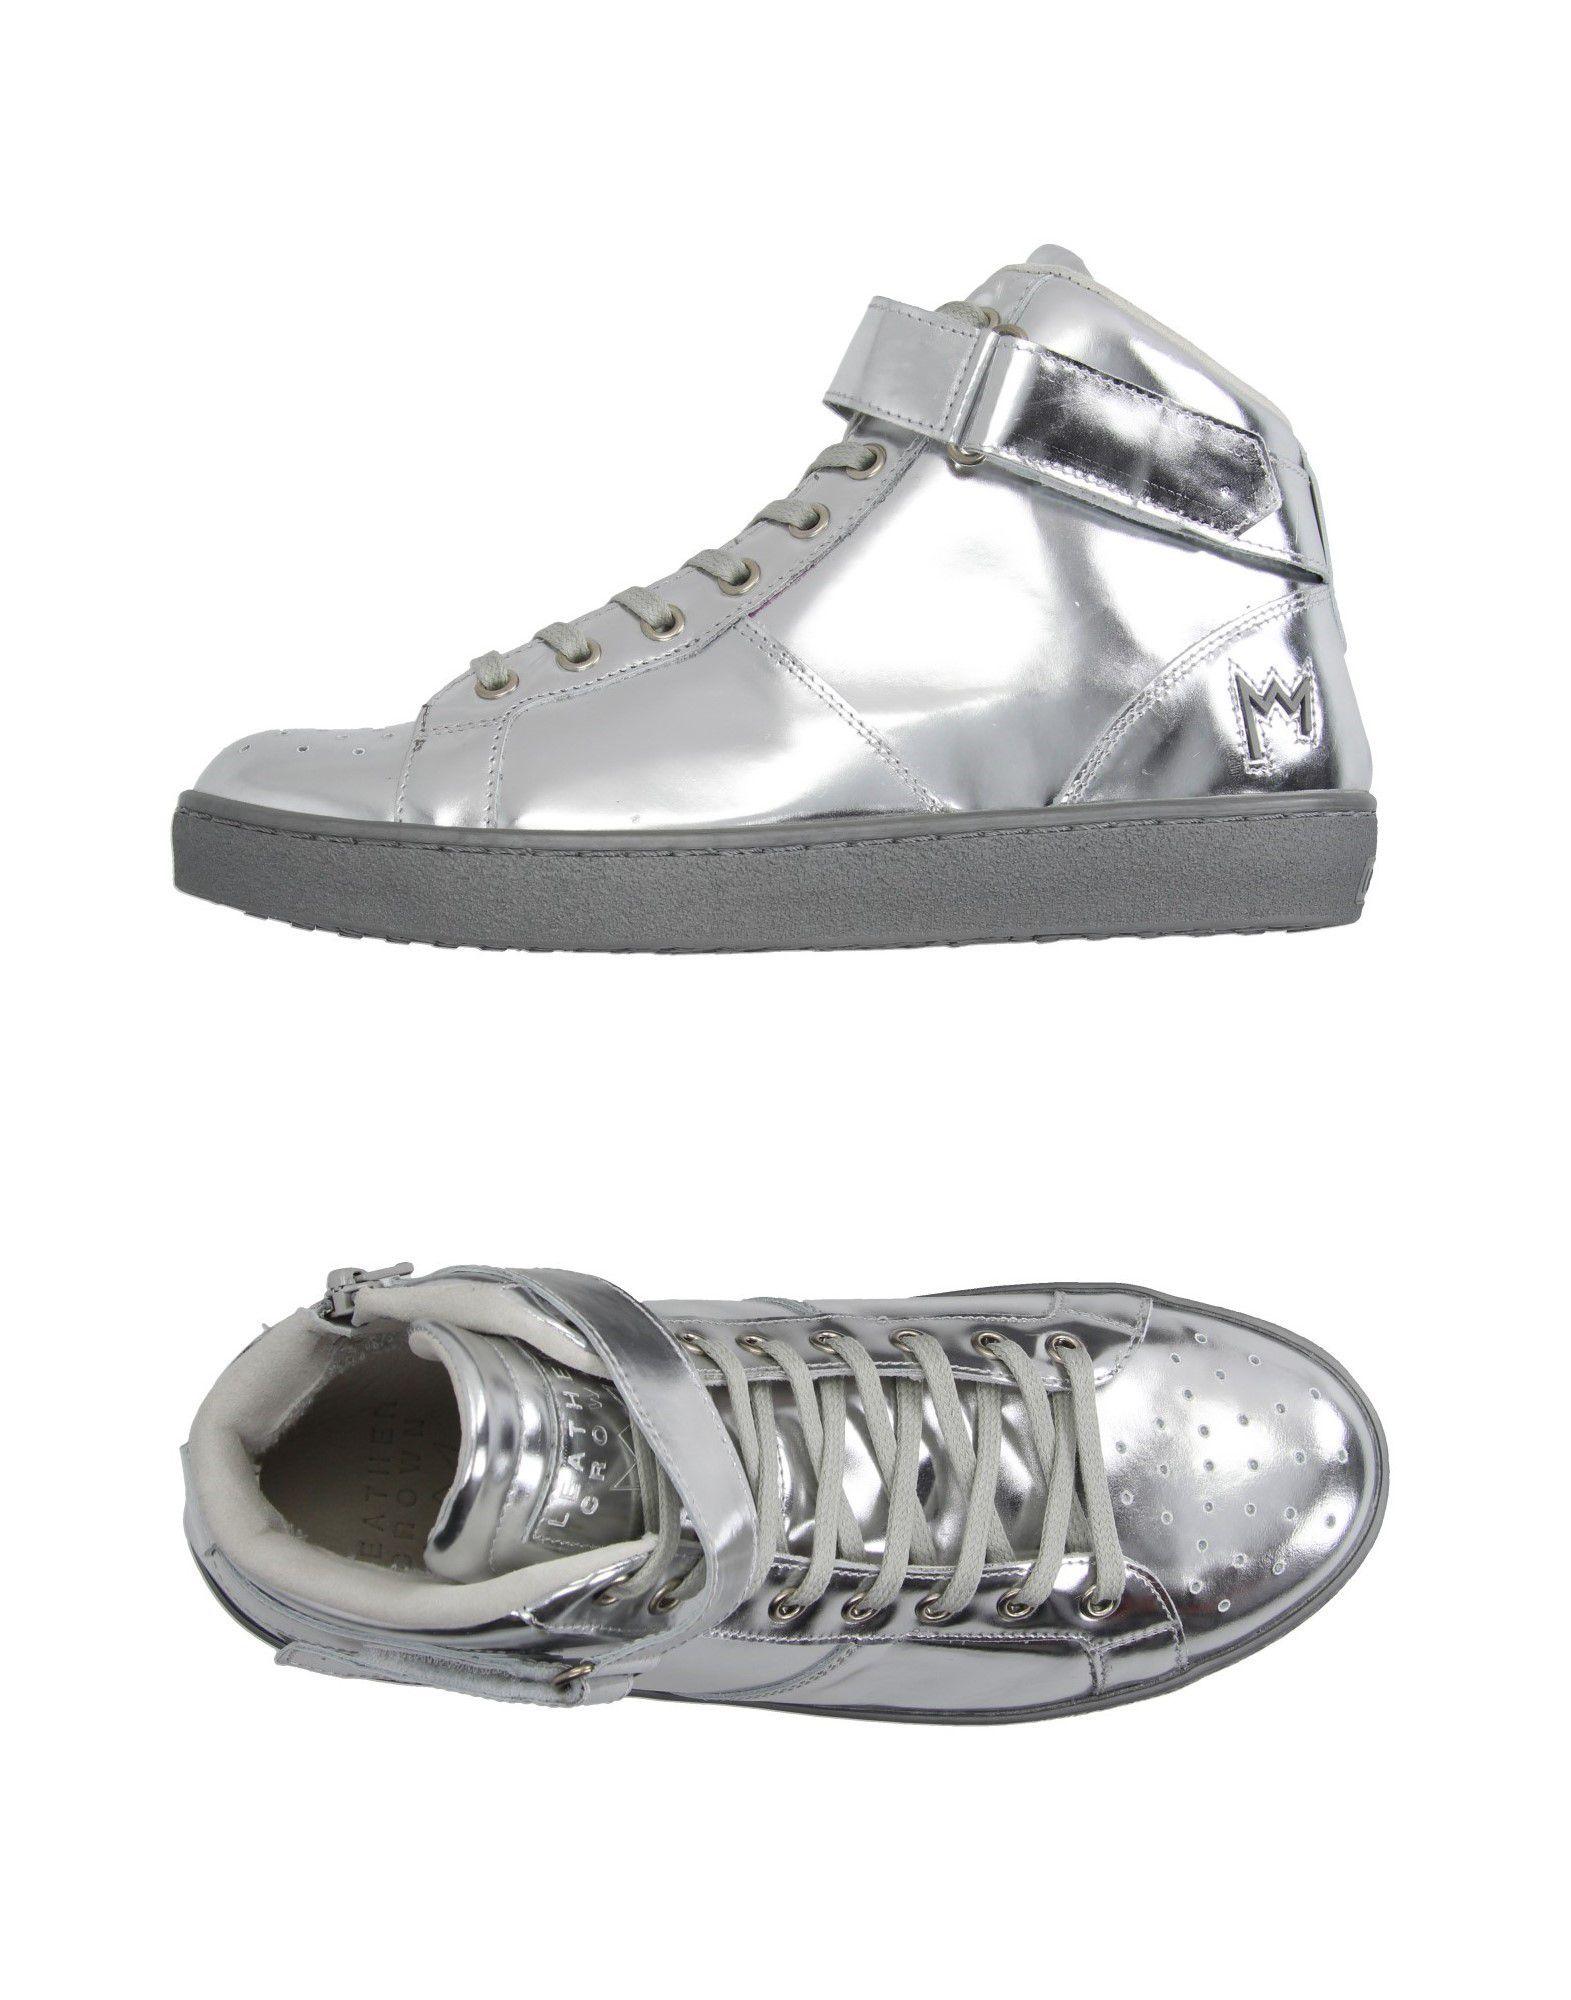 Stilvolle billige Sneakers Schuhe Leder Crown Sneakers billige Damen  11014009UT 1d2438